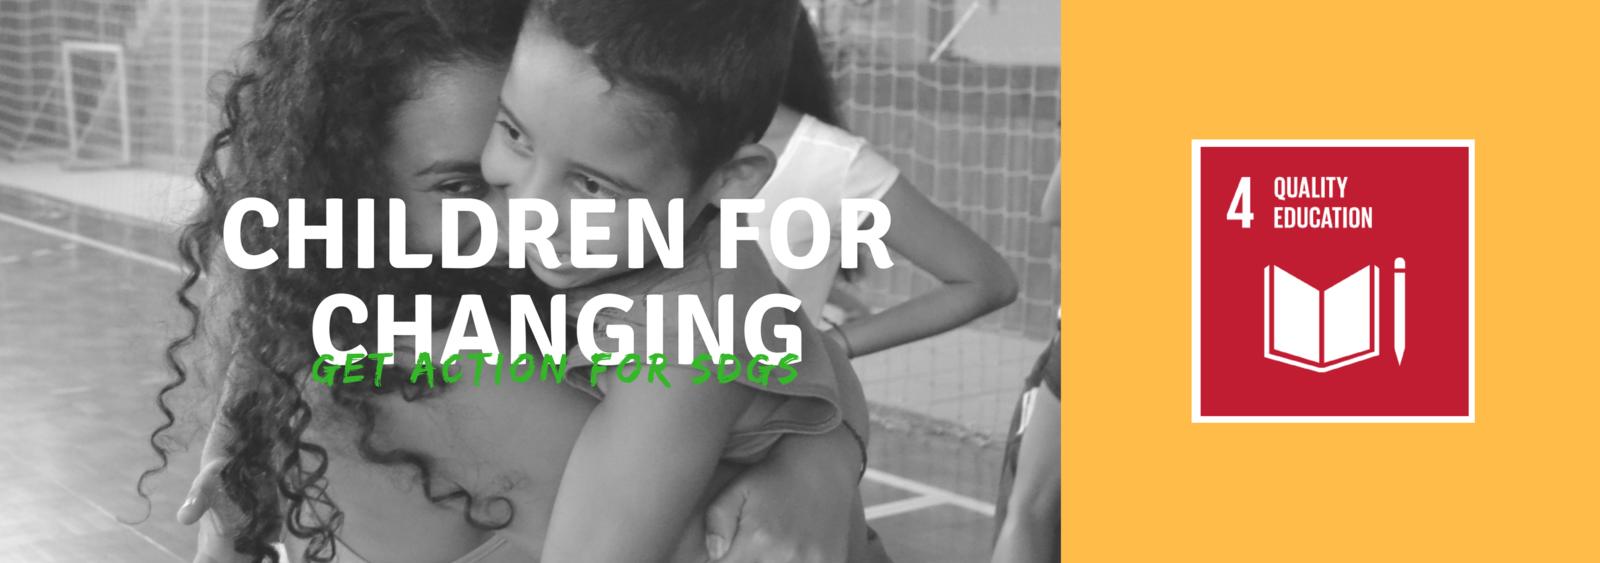 Impact children in Social vulnerability through SDGs [GM]